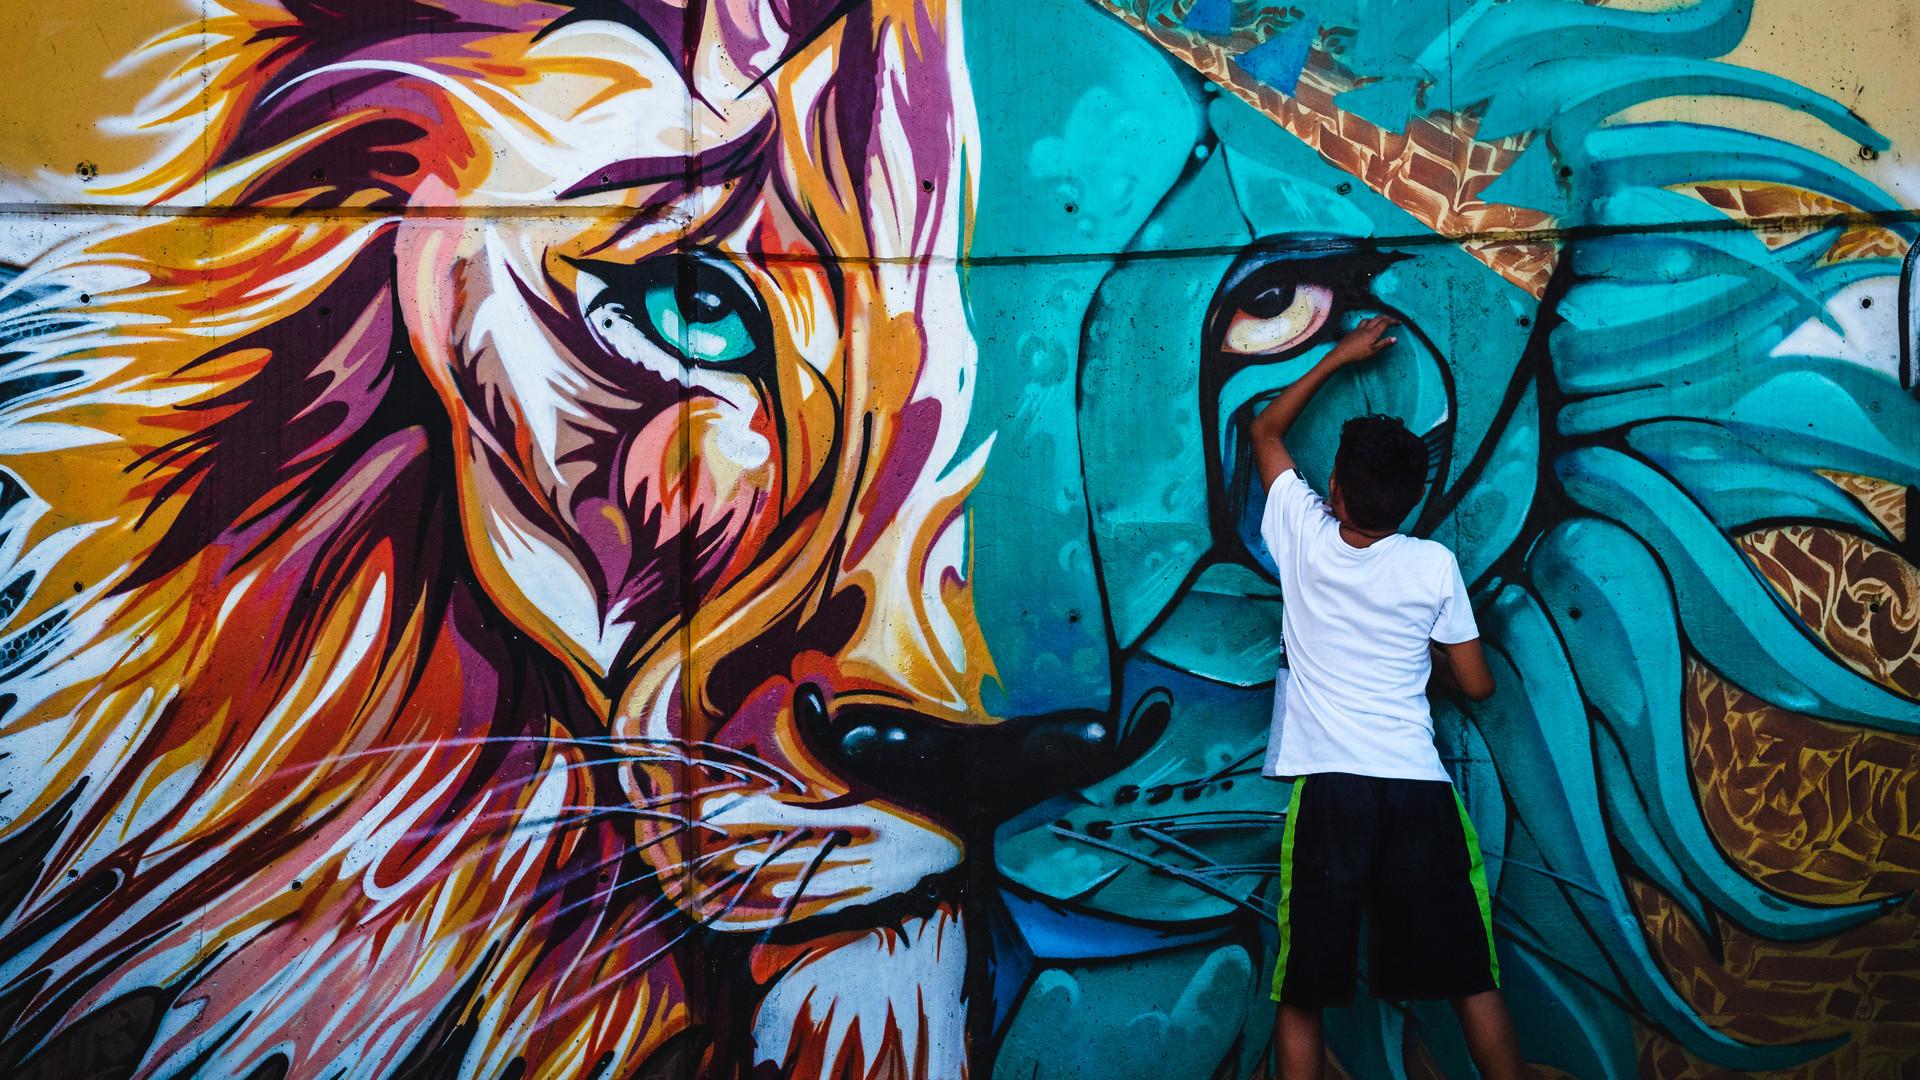 Young boy touching a graffiti lion